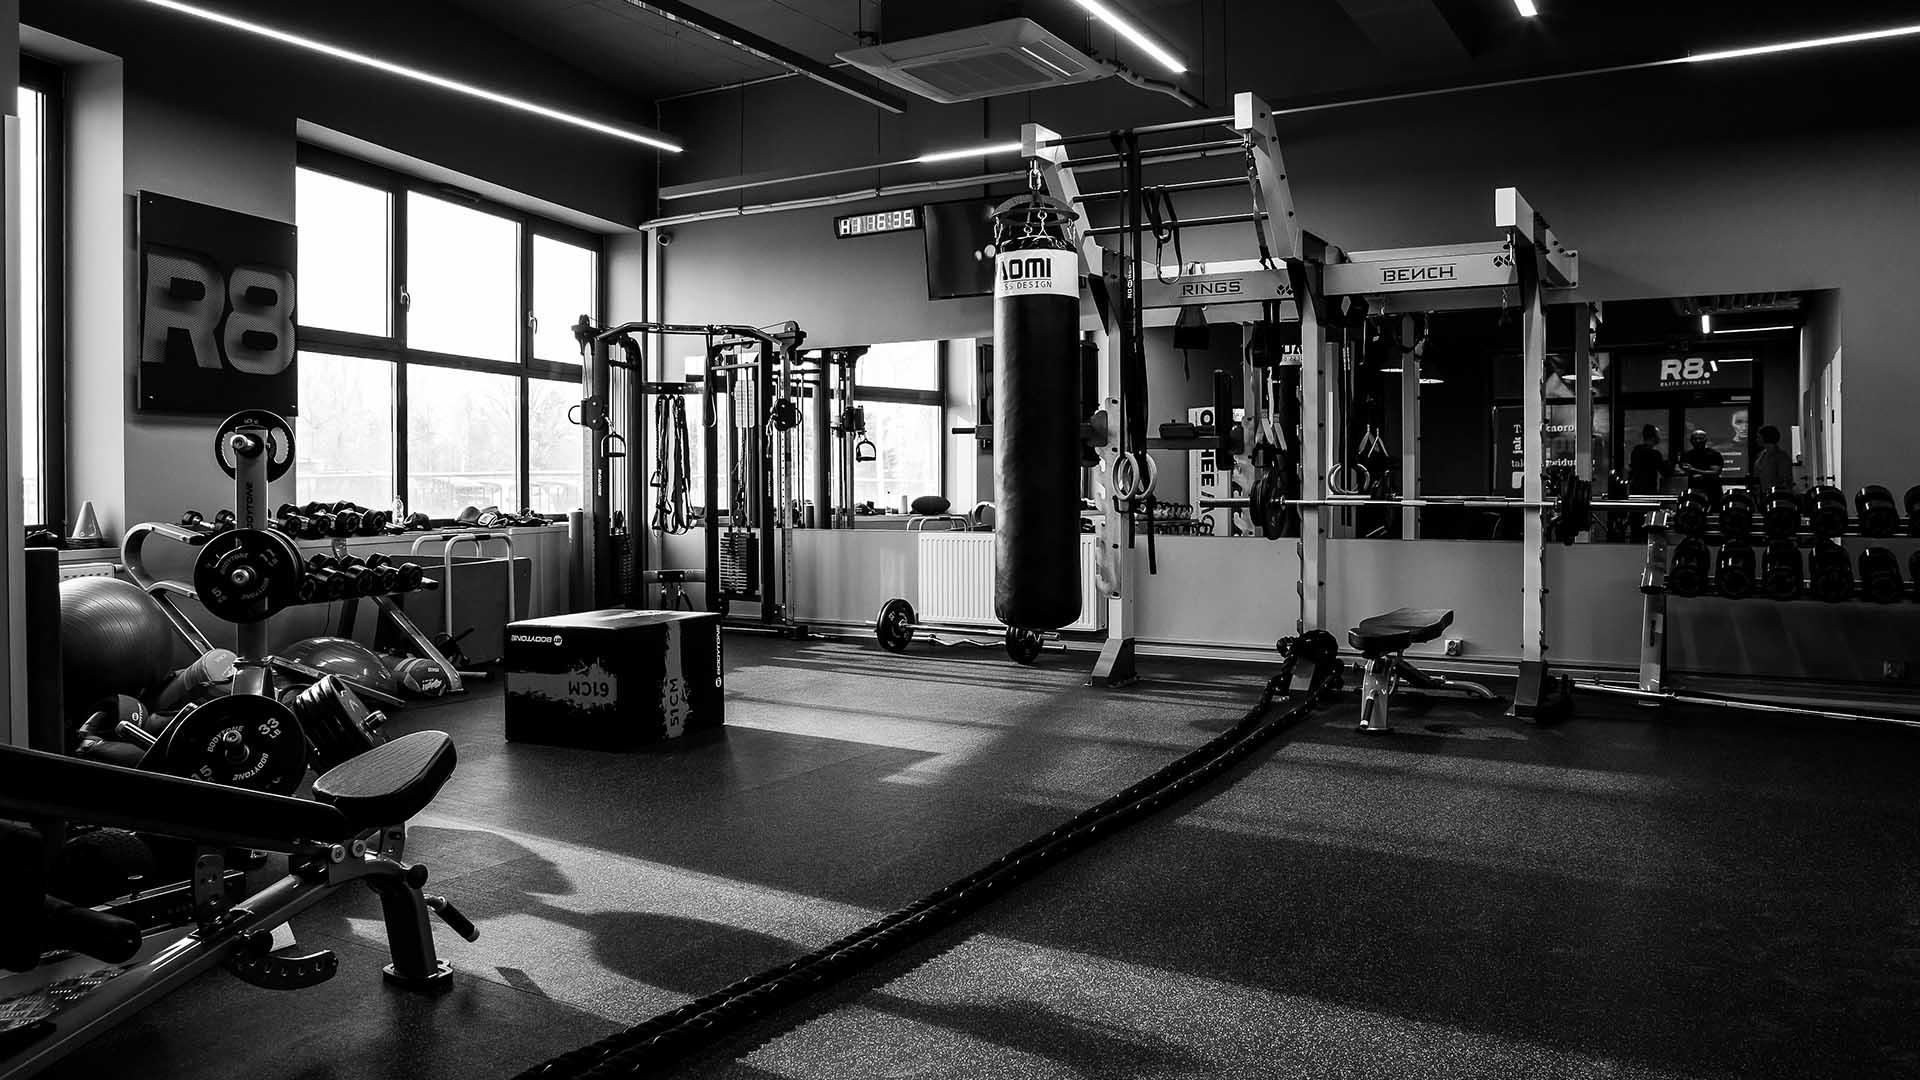 R8 elitarny klub fitness Lublin